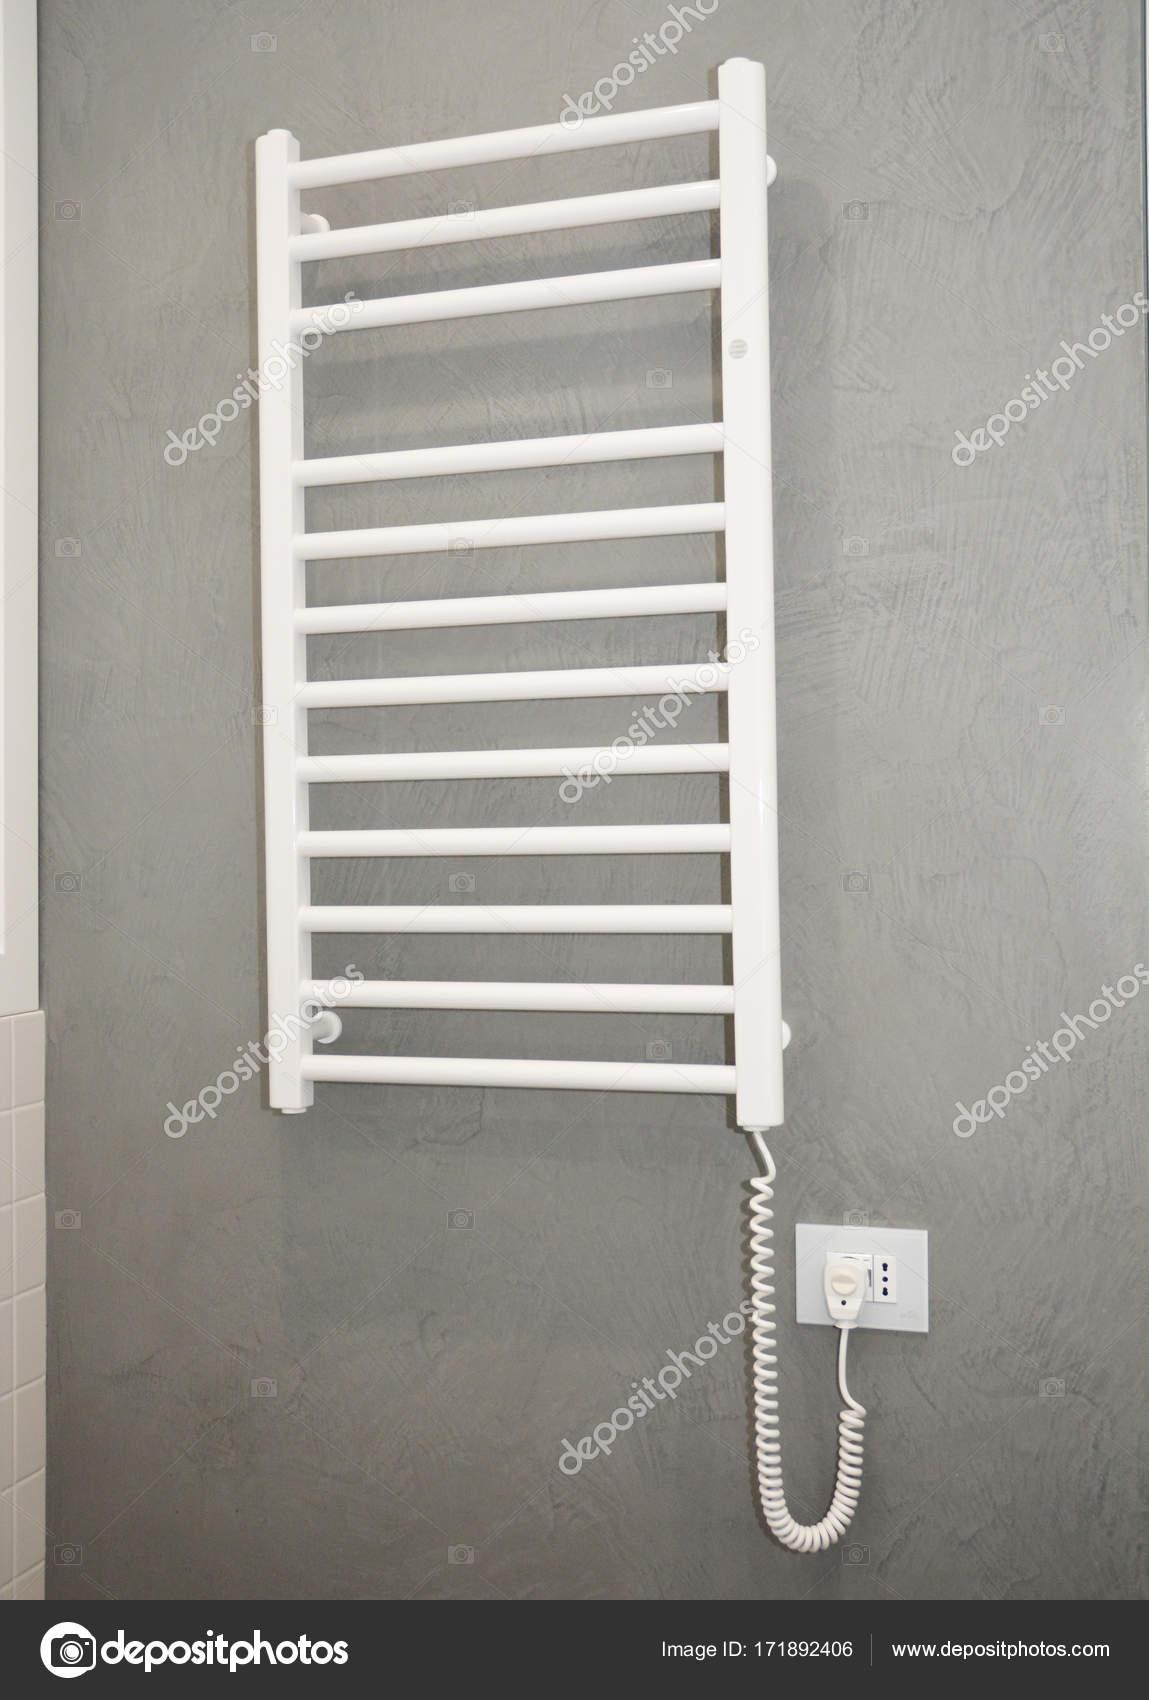 Handtuch Heizkörper Handtuchhalter Elements.Thermostatic Electric ...